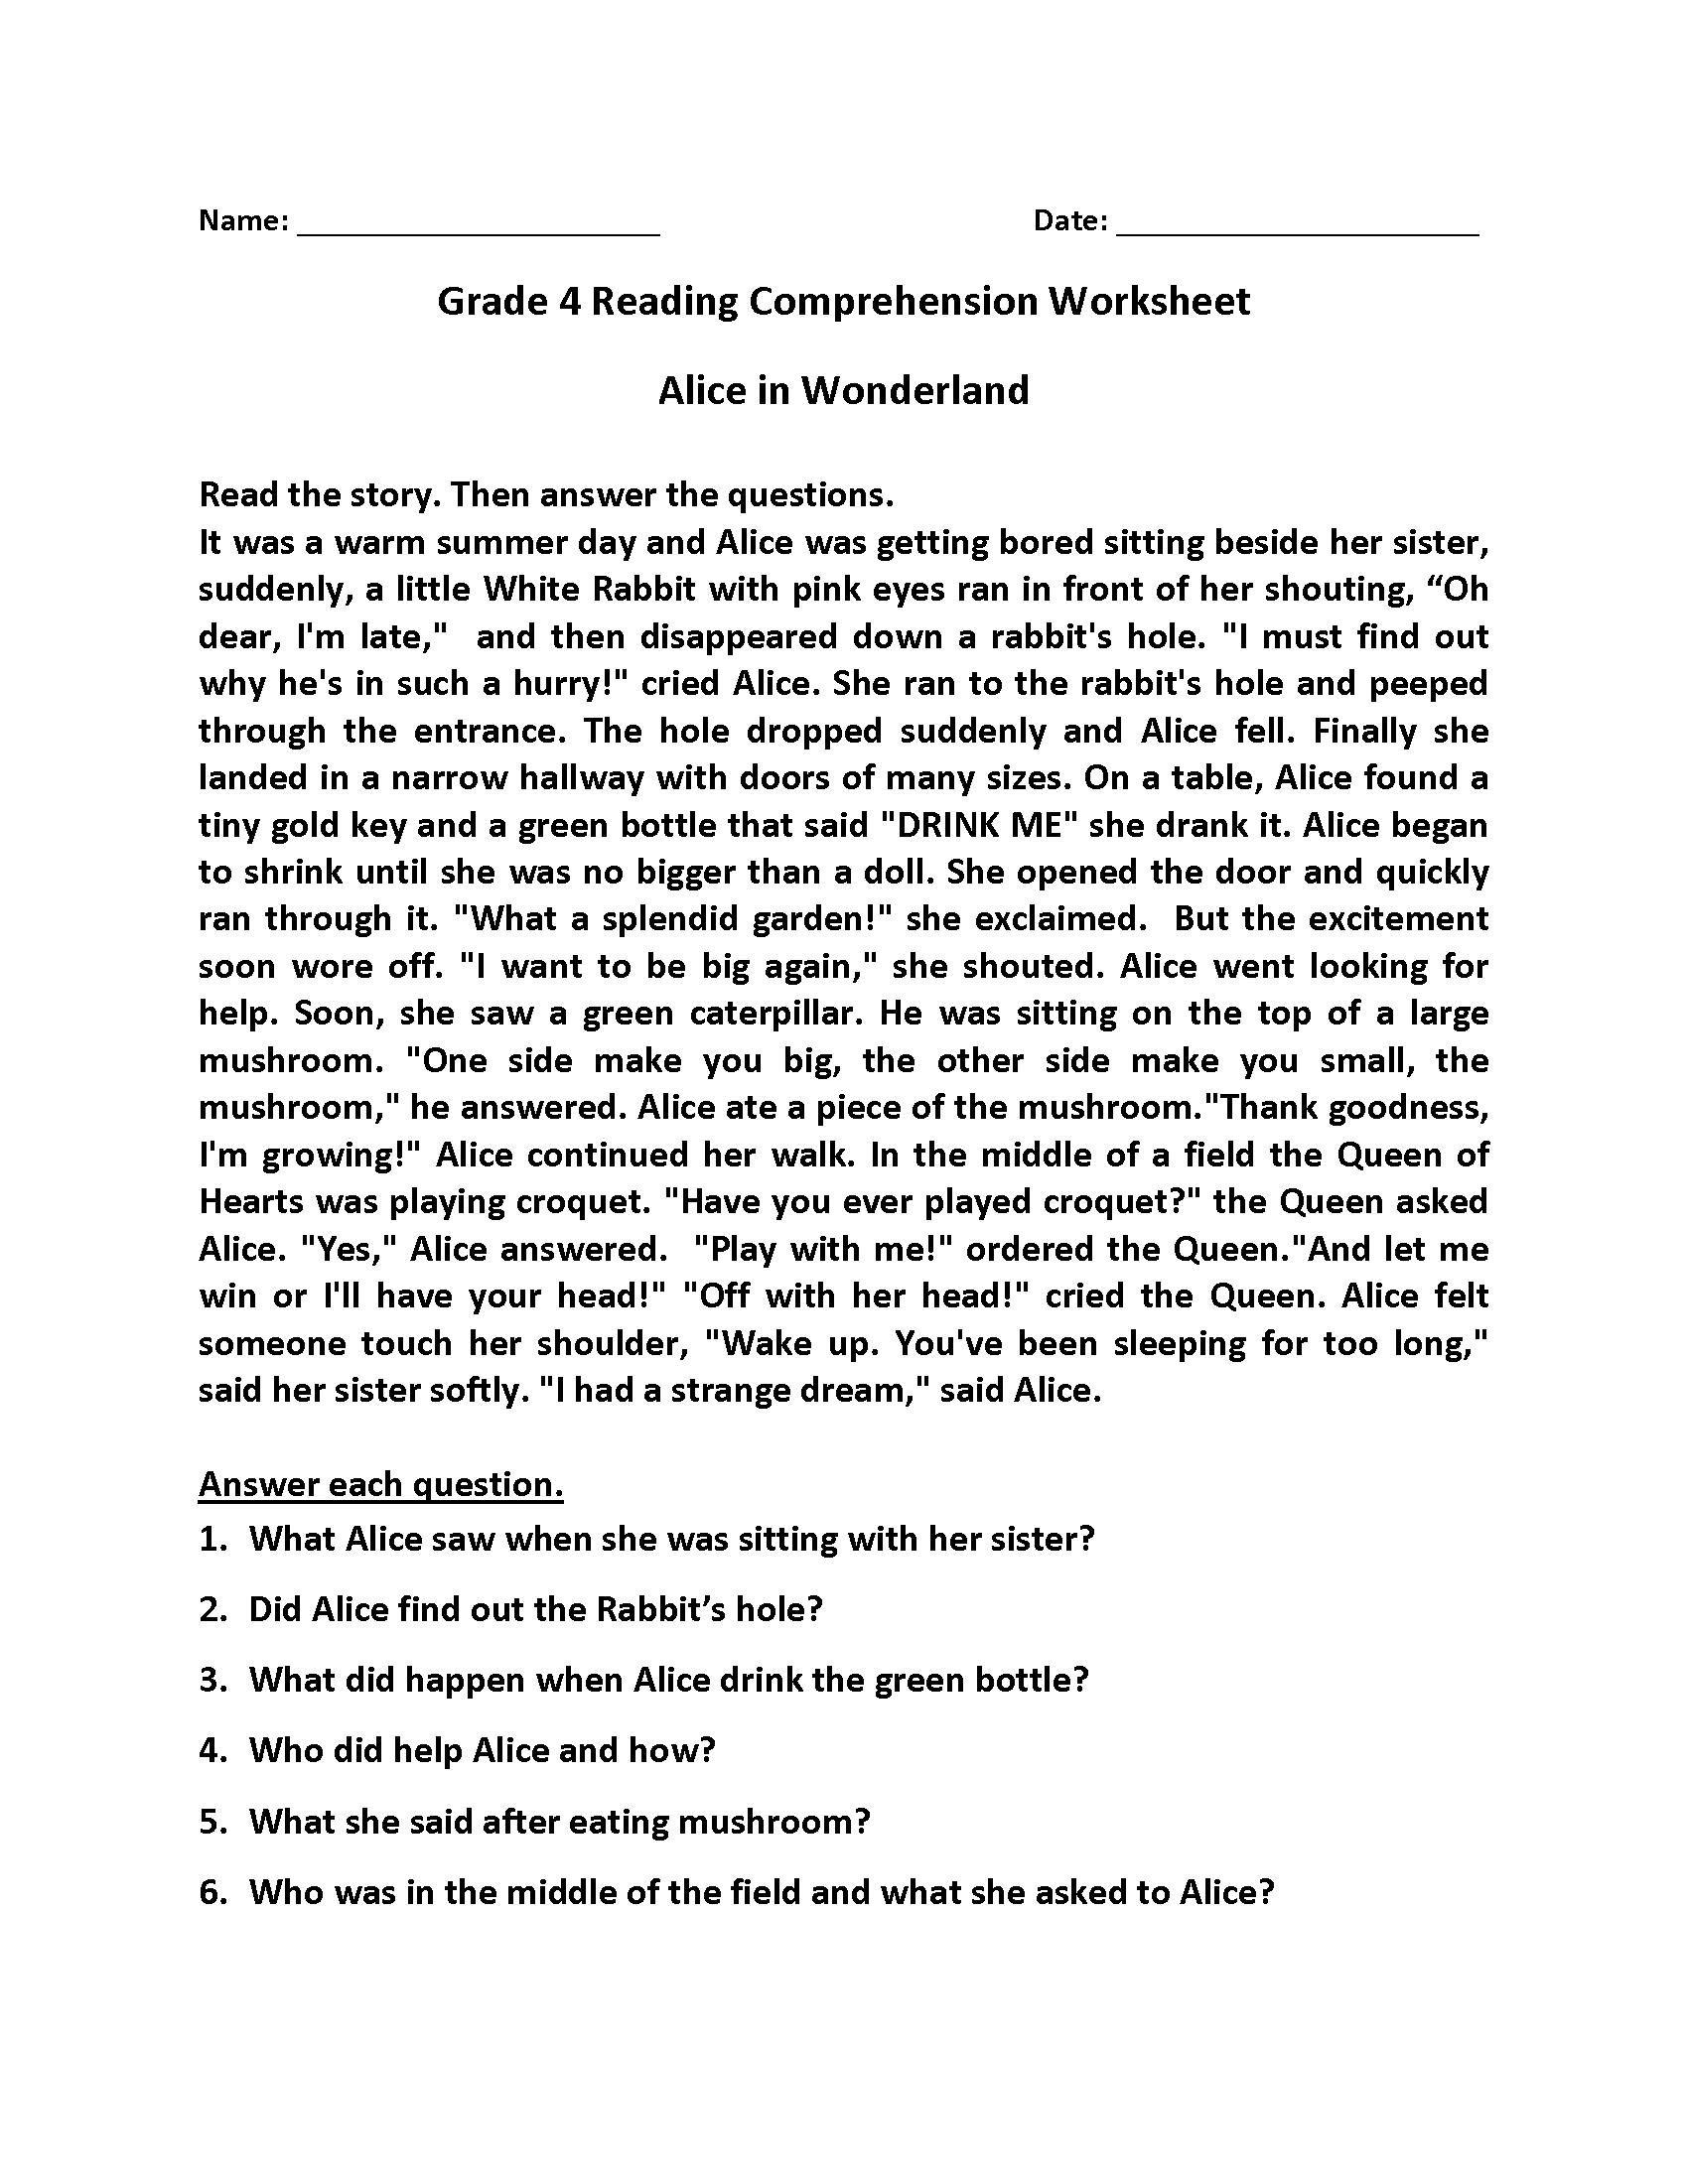 4Th Grade Reading Comprehension Worksheets - Best Coloring